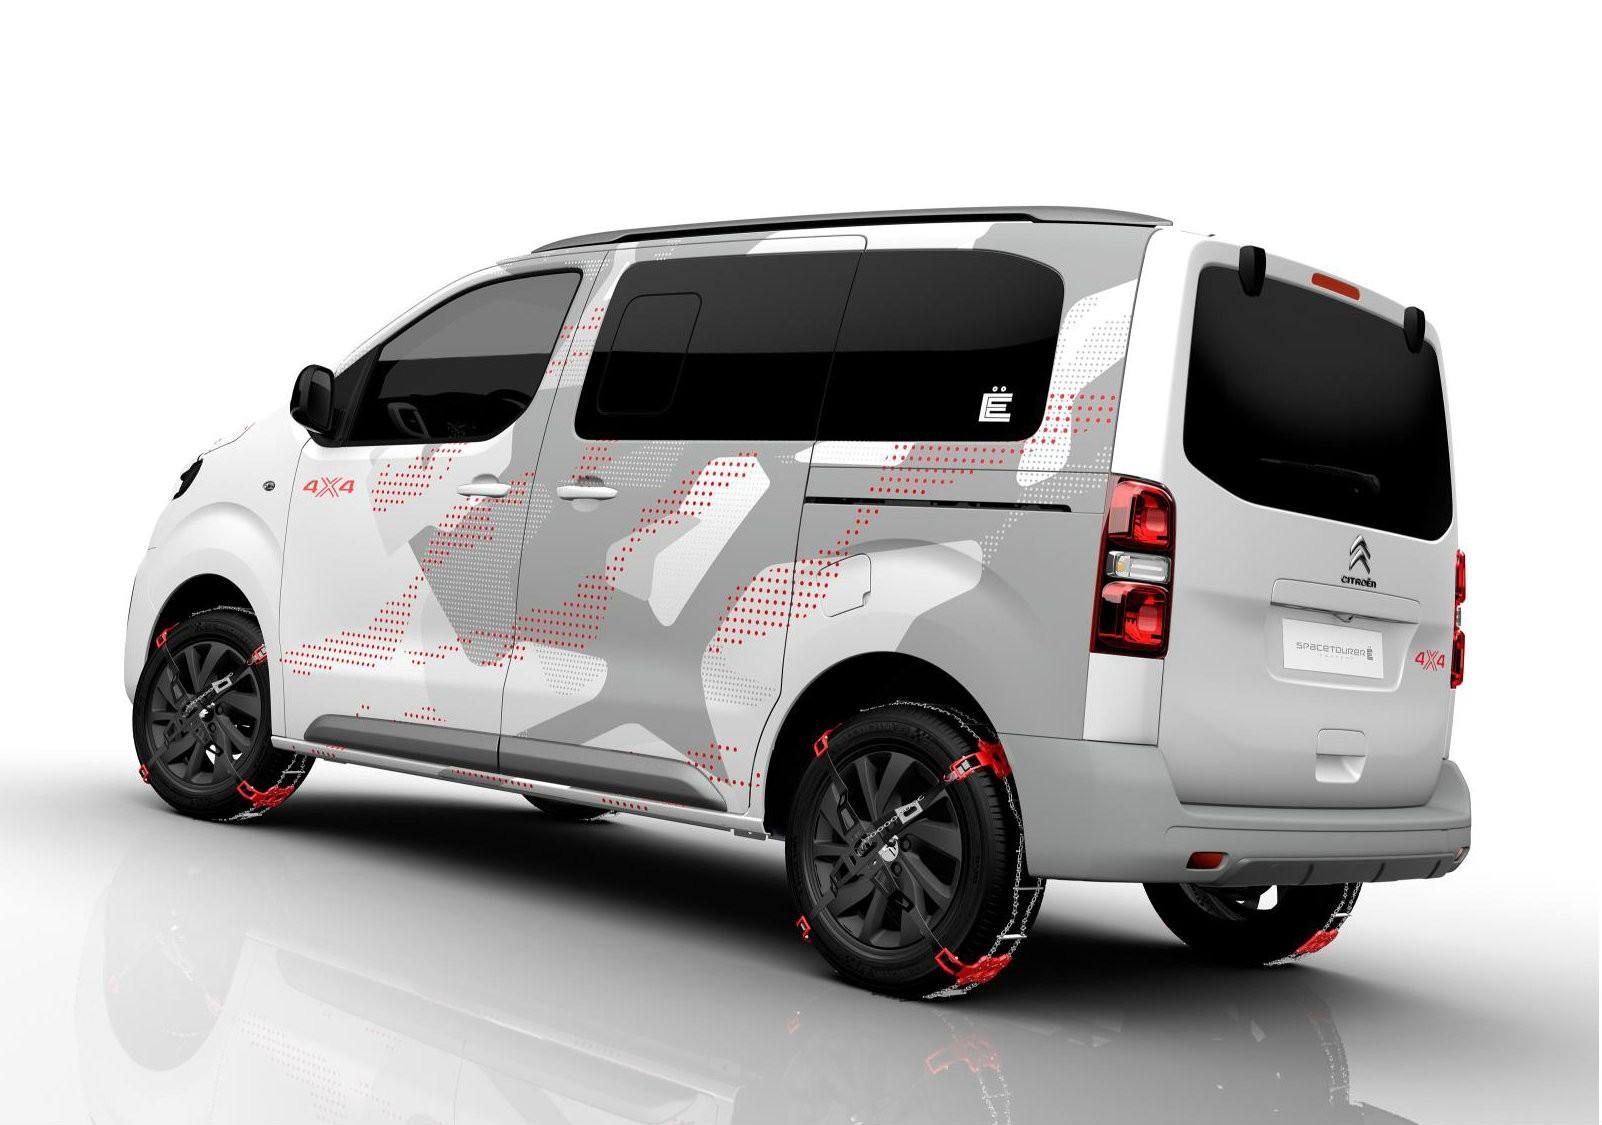 citroen spacetourer 4x4 e concept is geared up for adventure autoevolution. Black Bedroom Furniture Sets. Home Design Ideas